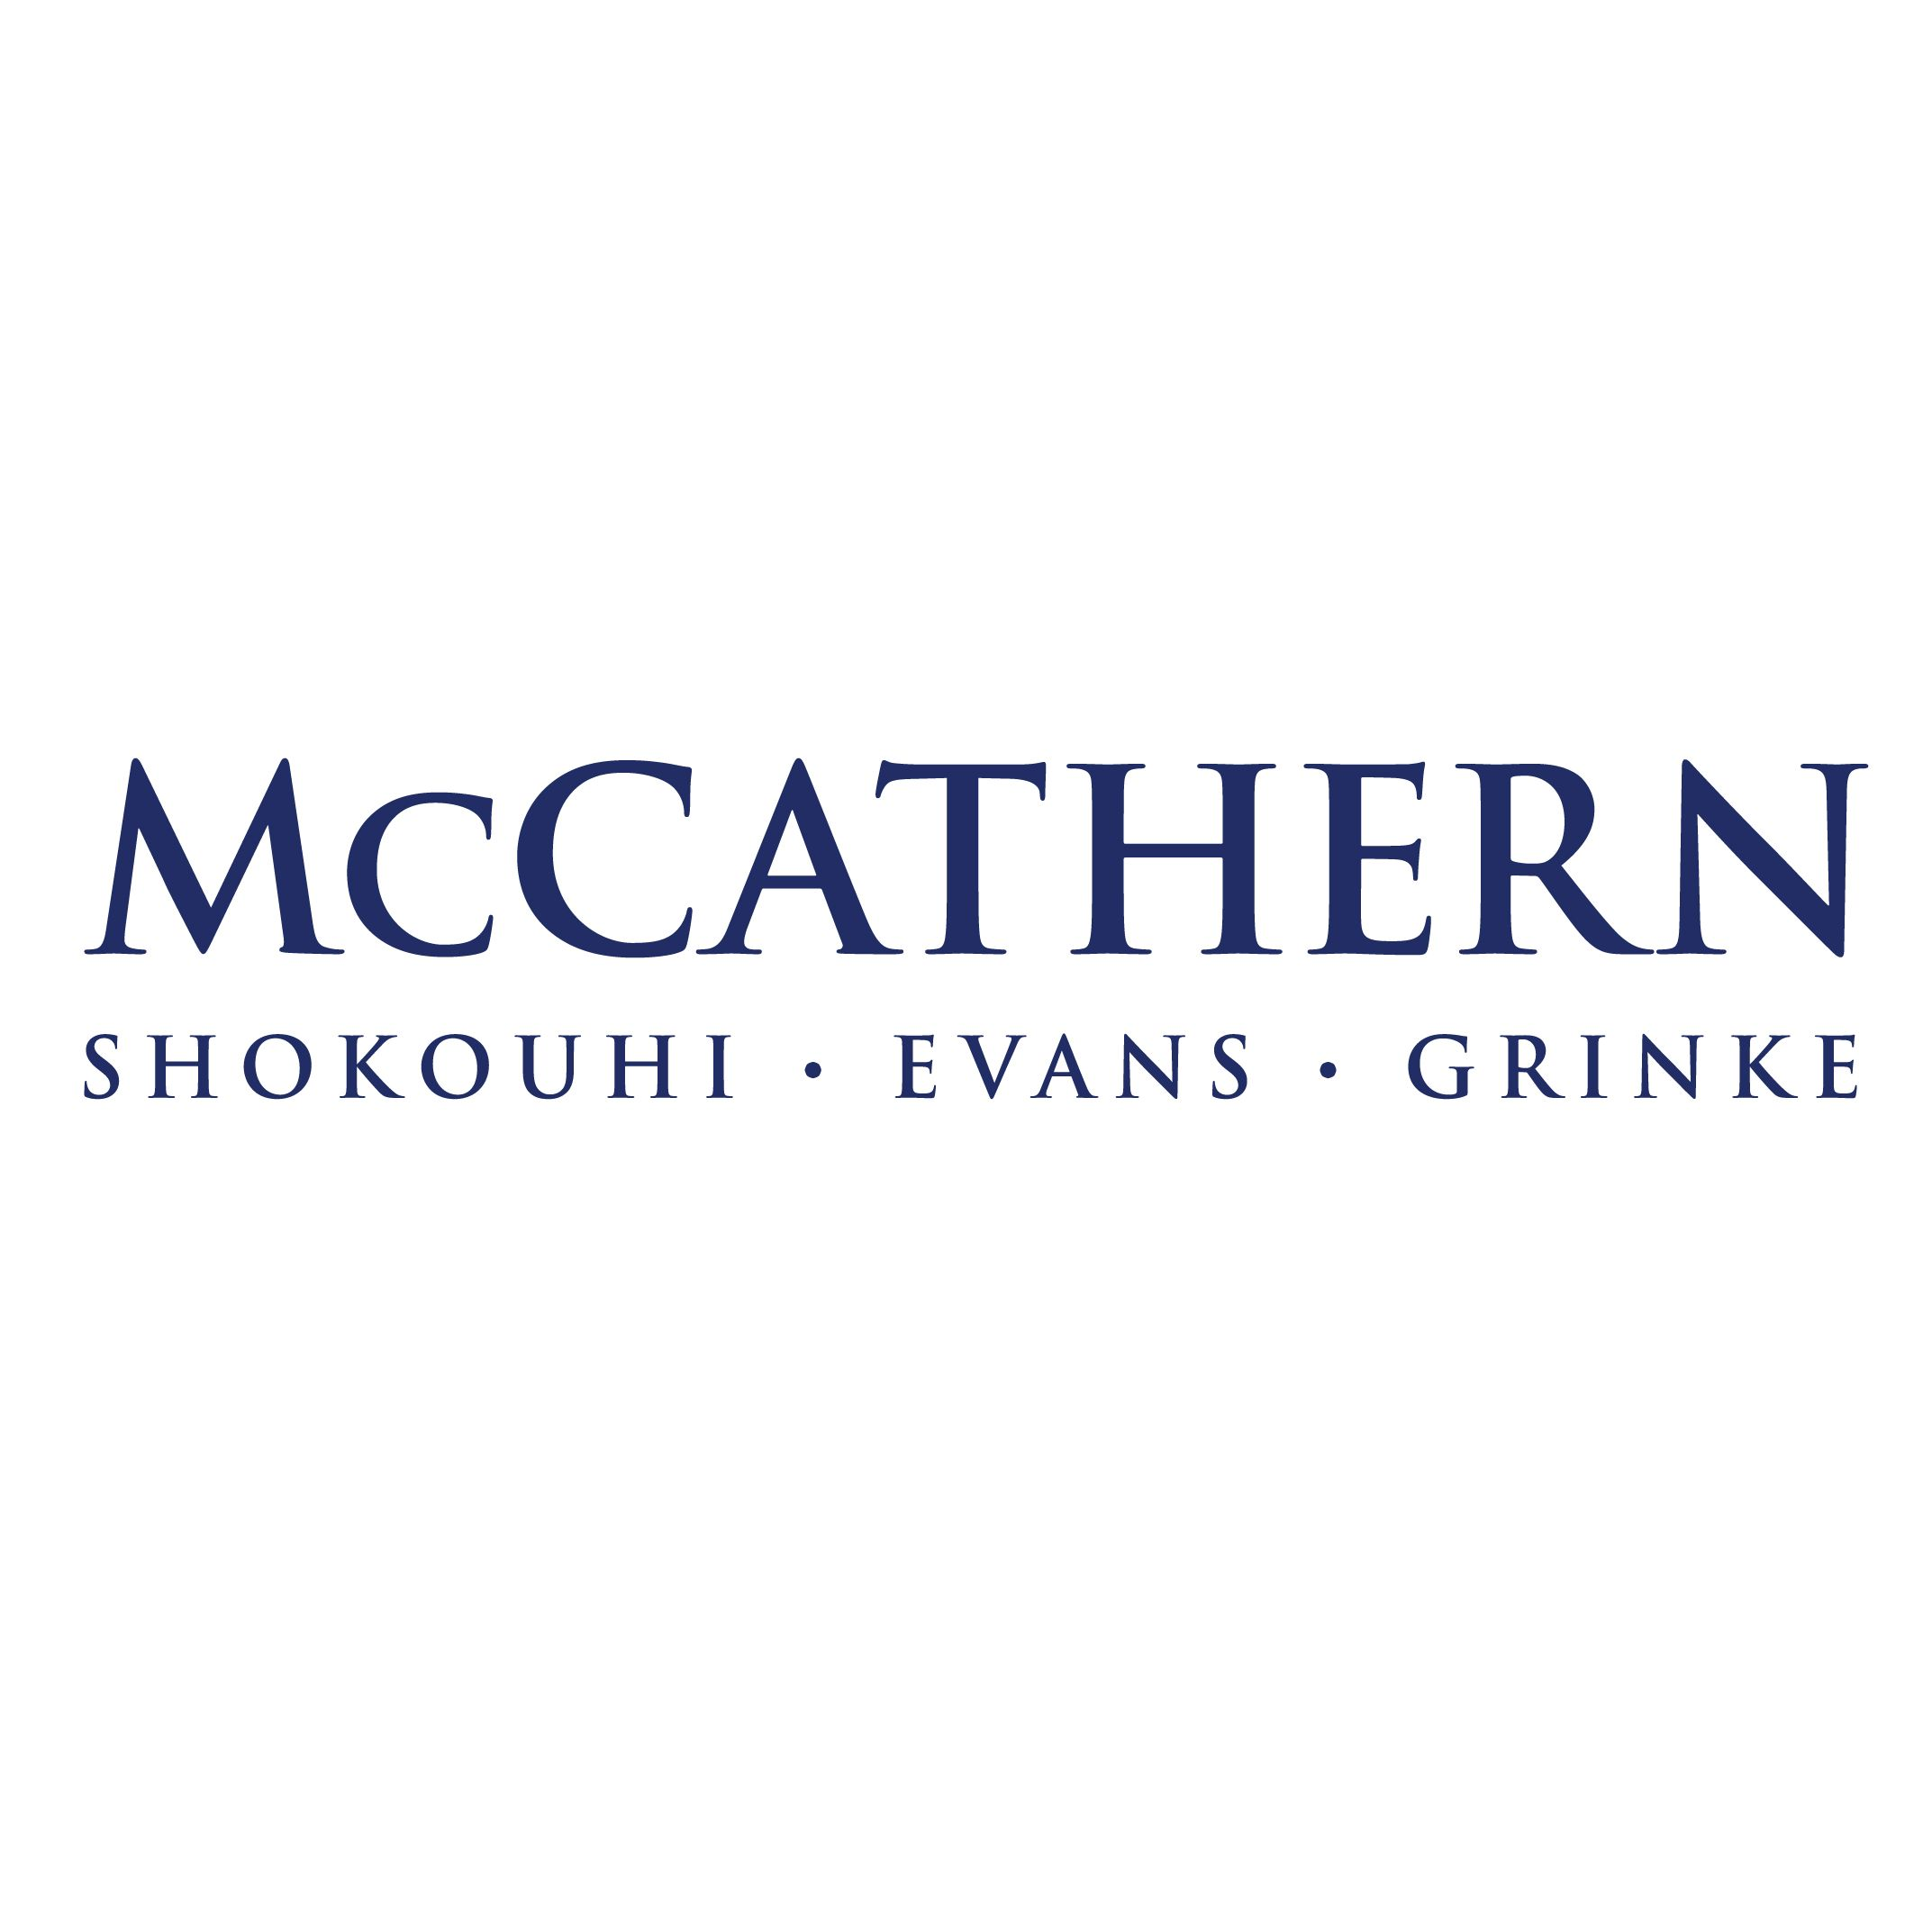 McCathern, Shokouhi, Evans, Grinke law firm logo